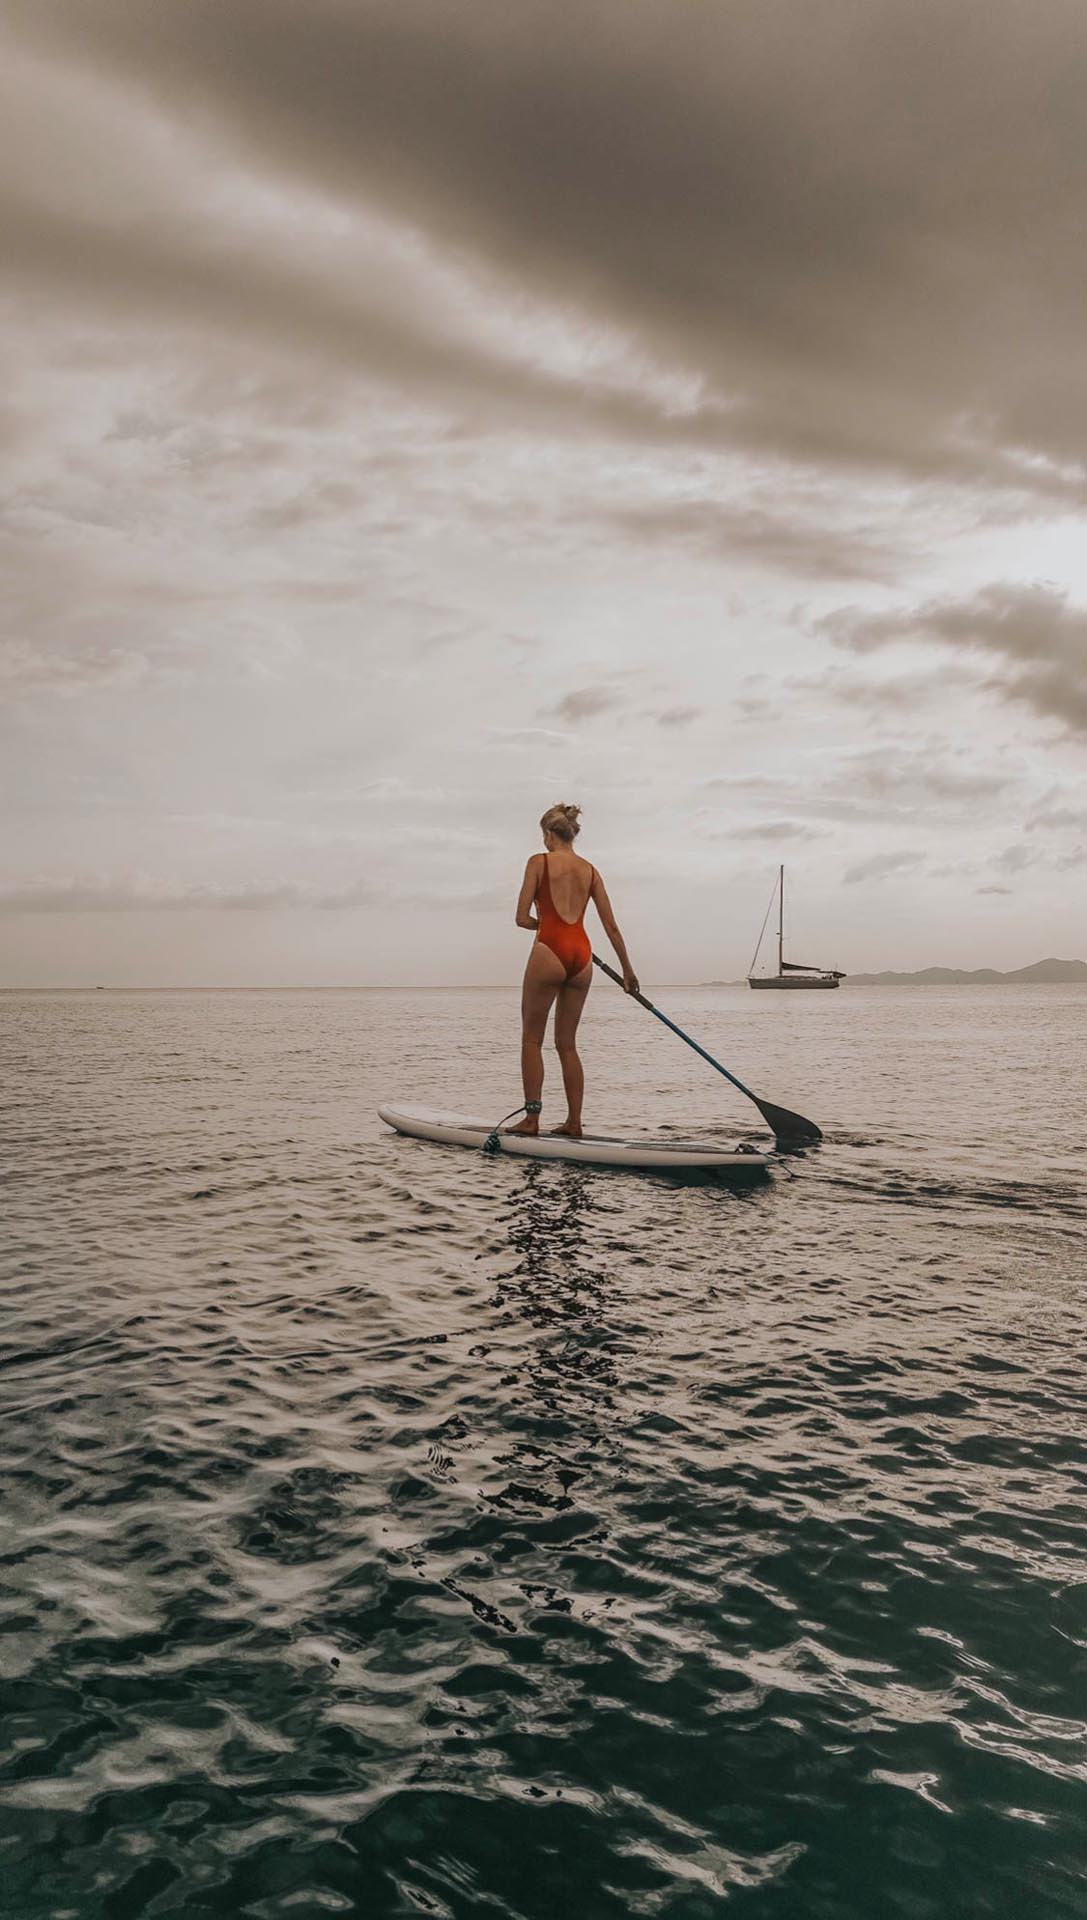 SUP stand up paddling paddle thailande thailand krabi hotel dusit madebyf a fashion taste blogger